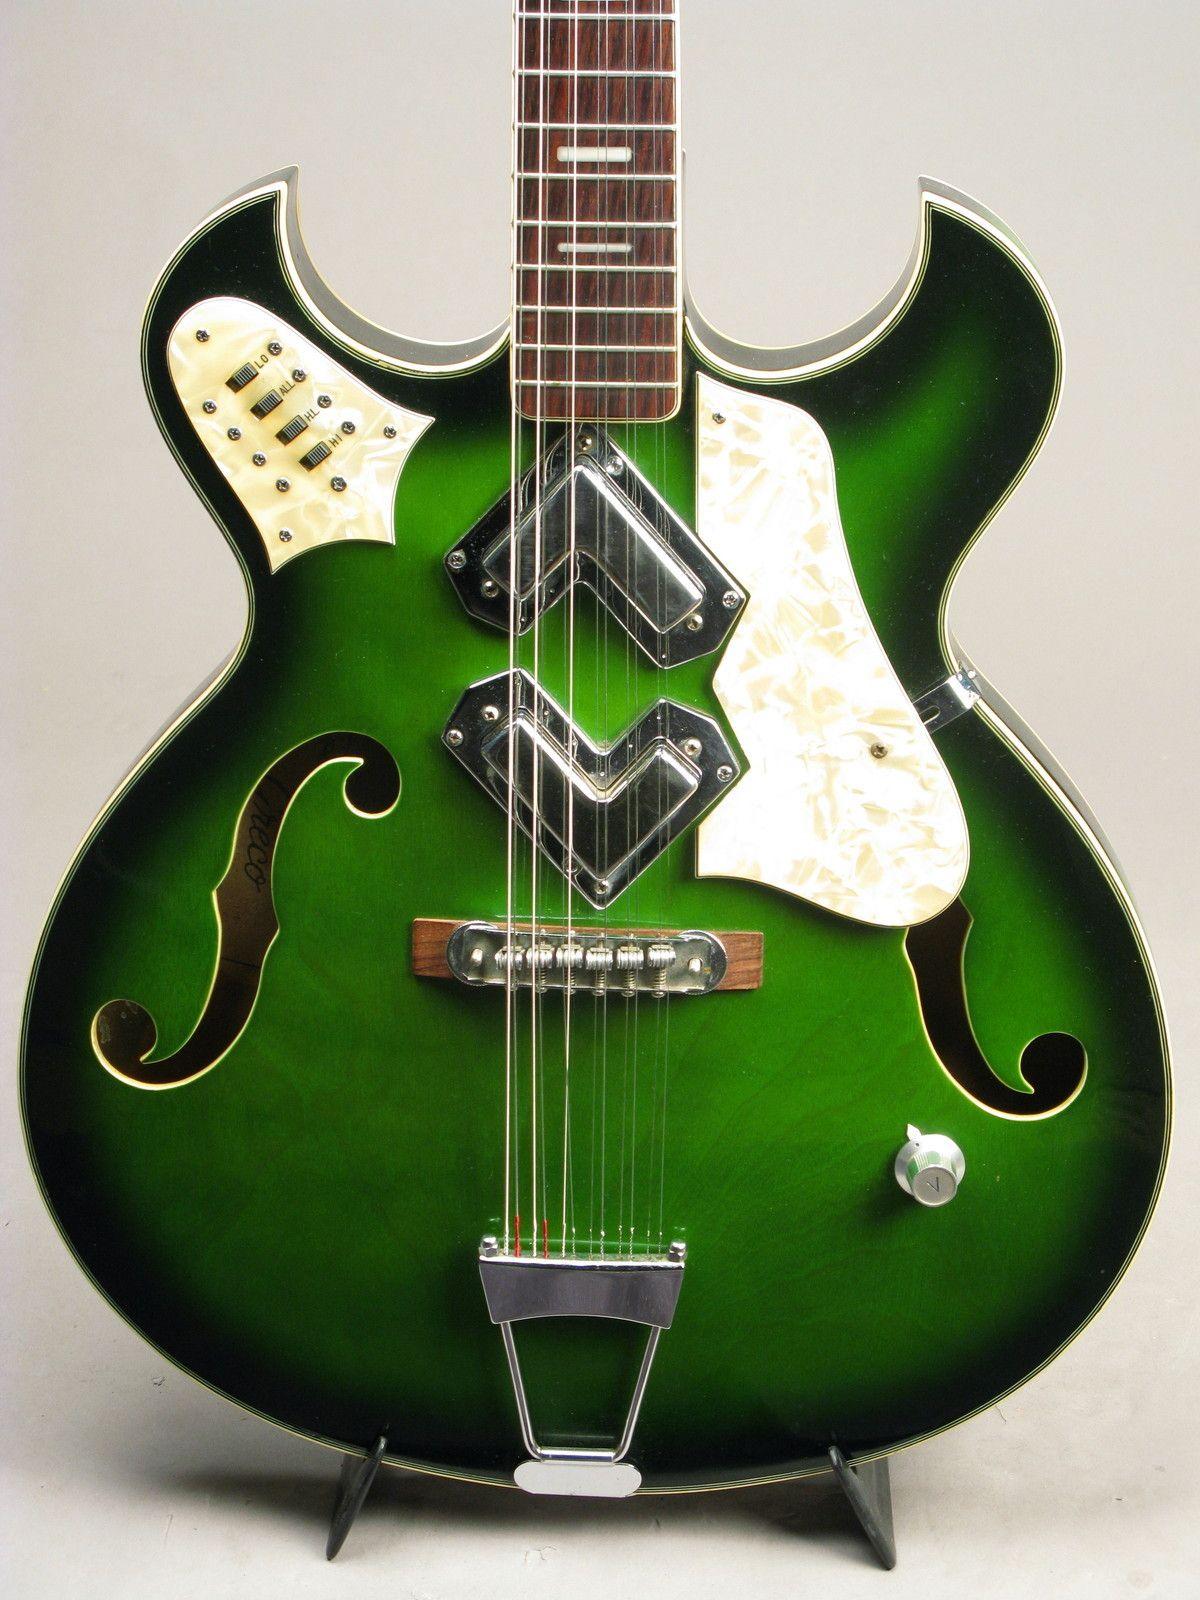 1960s Greco 12 String Model Gr 960 Shrike Greenburst W Boomerang